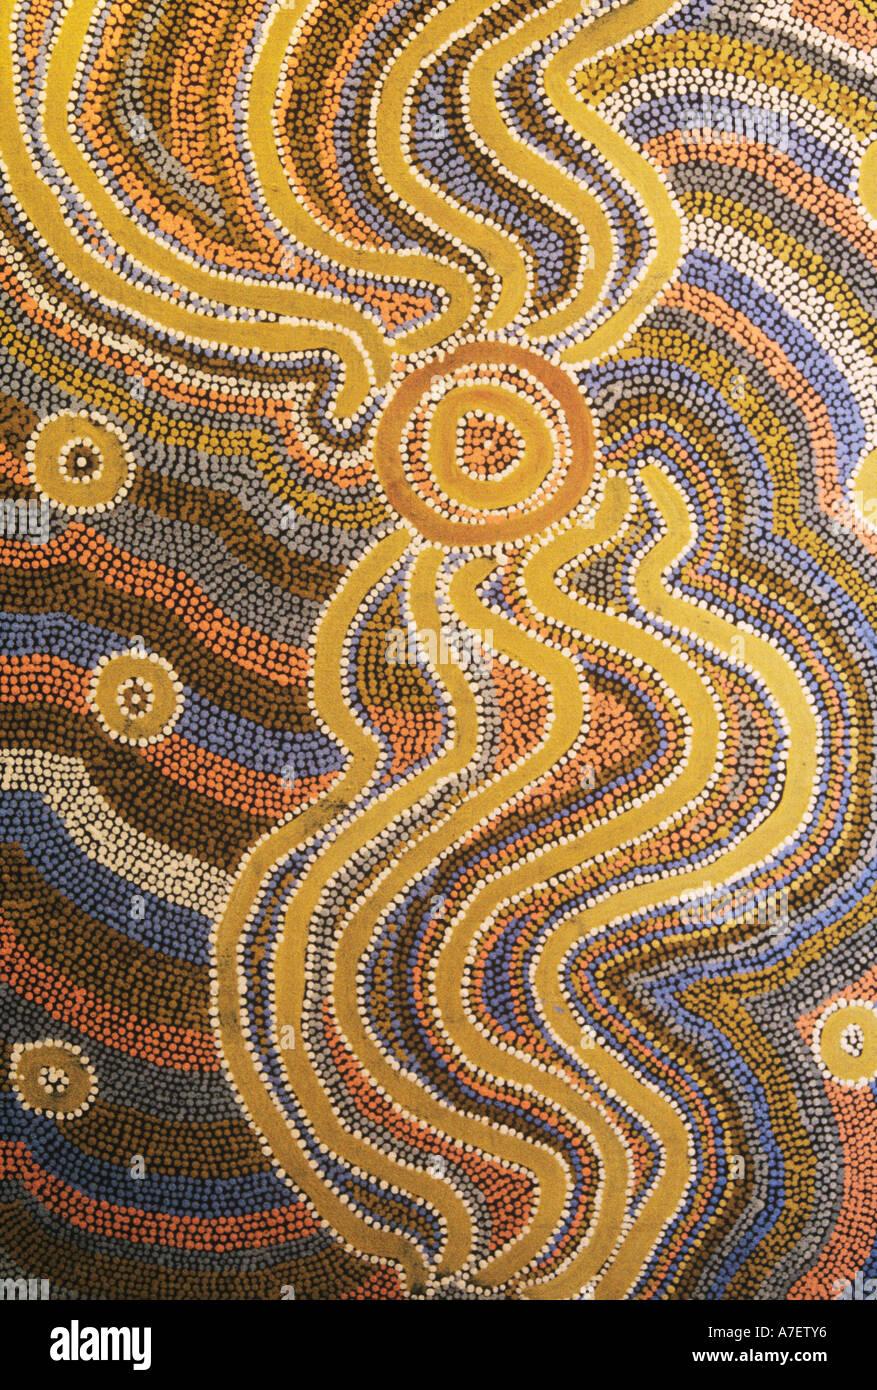 Aboriginal Dreamtime Painting Central Australia Stock Photo